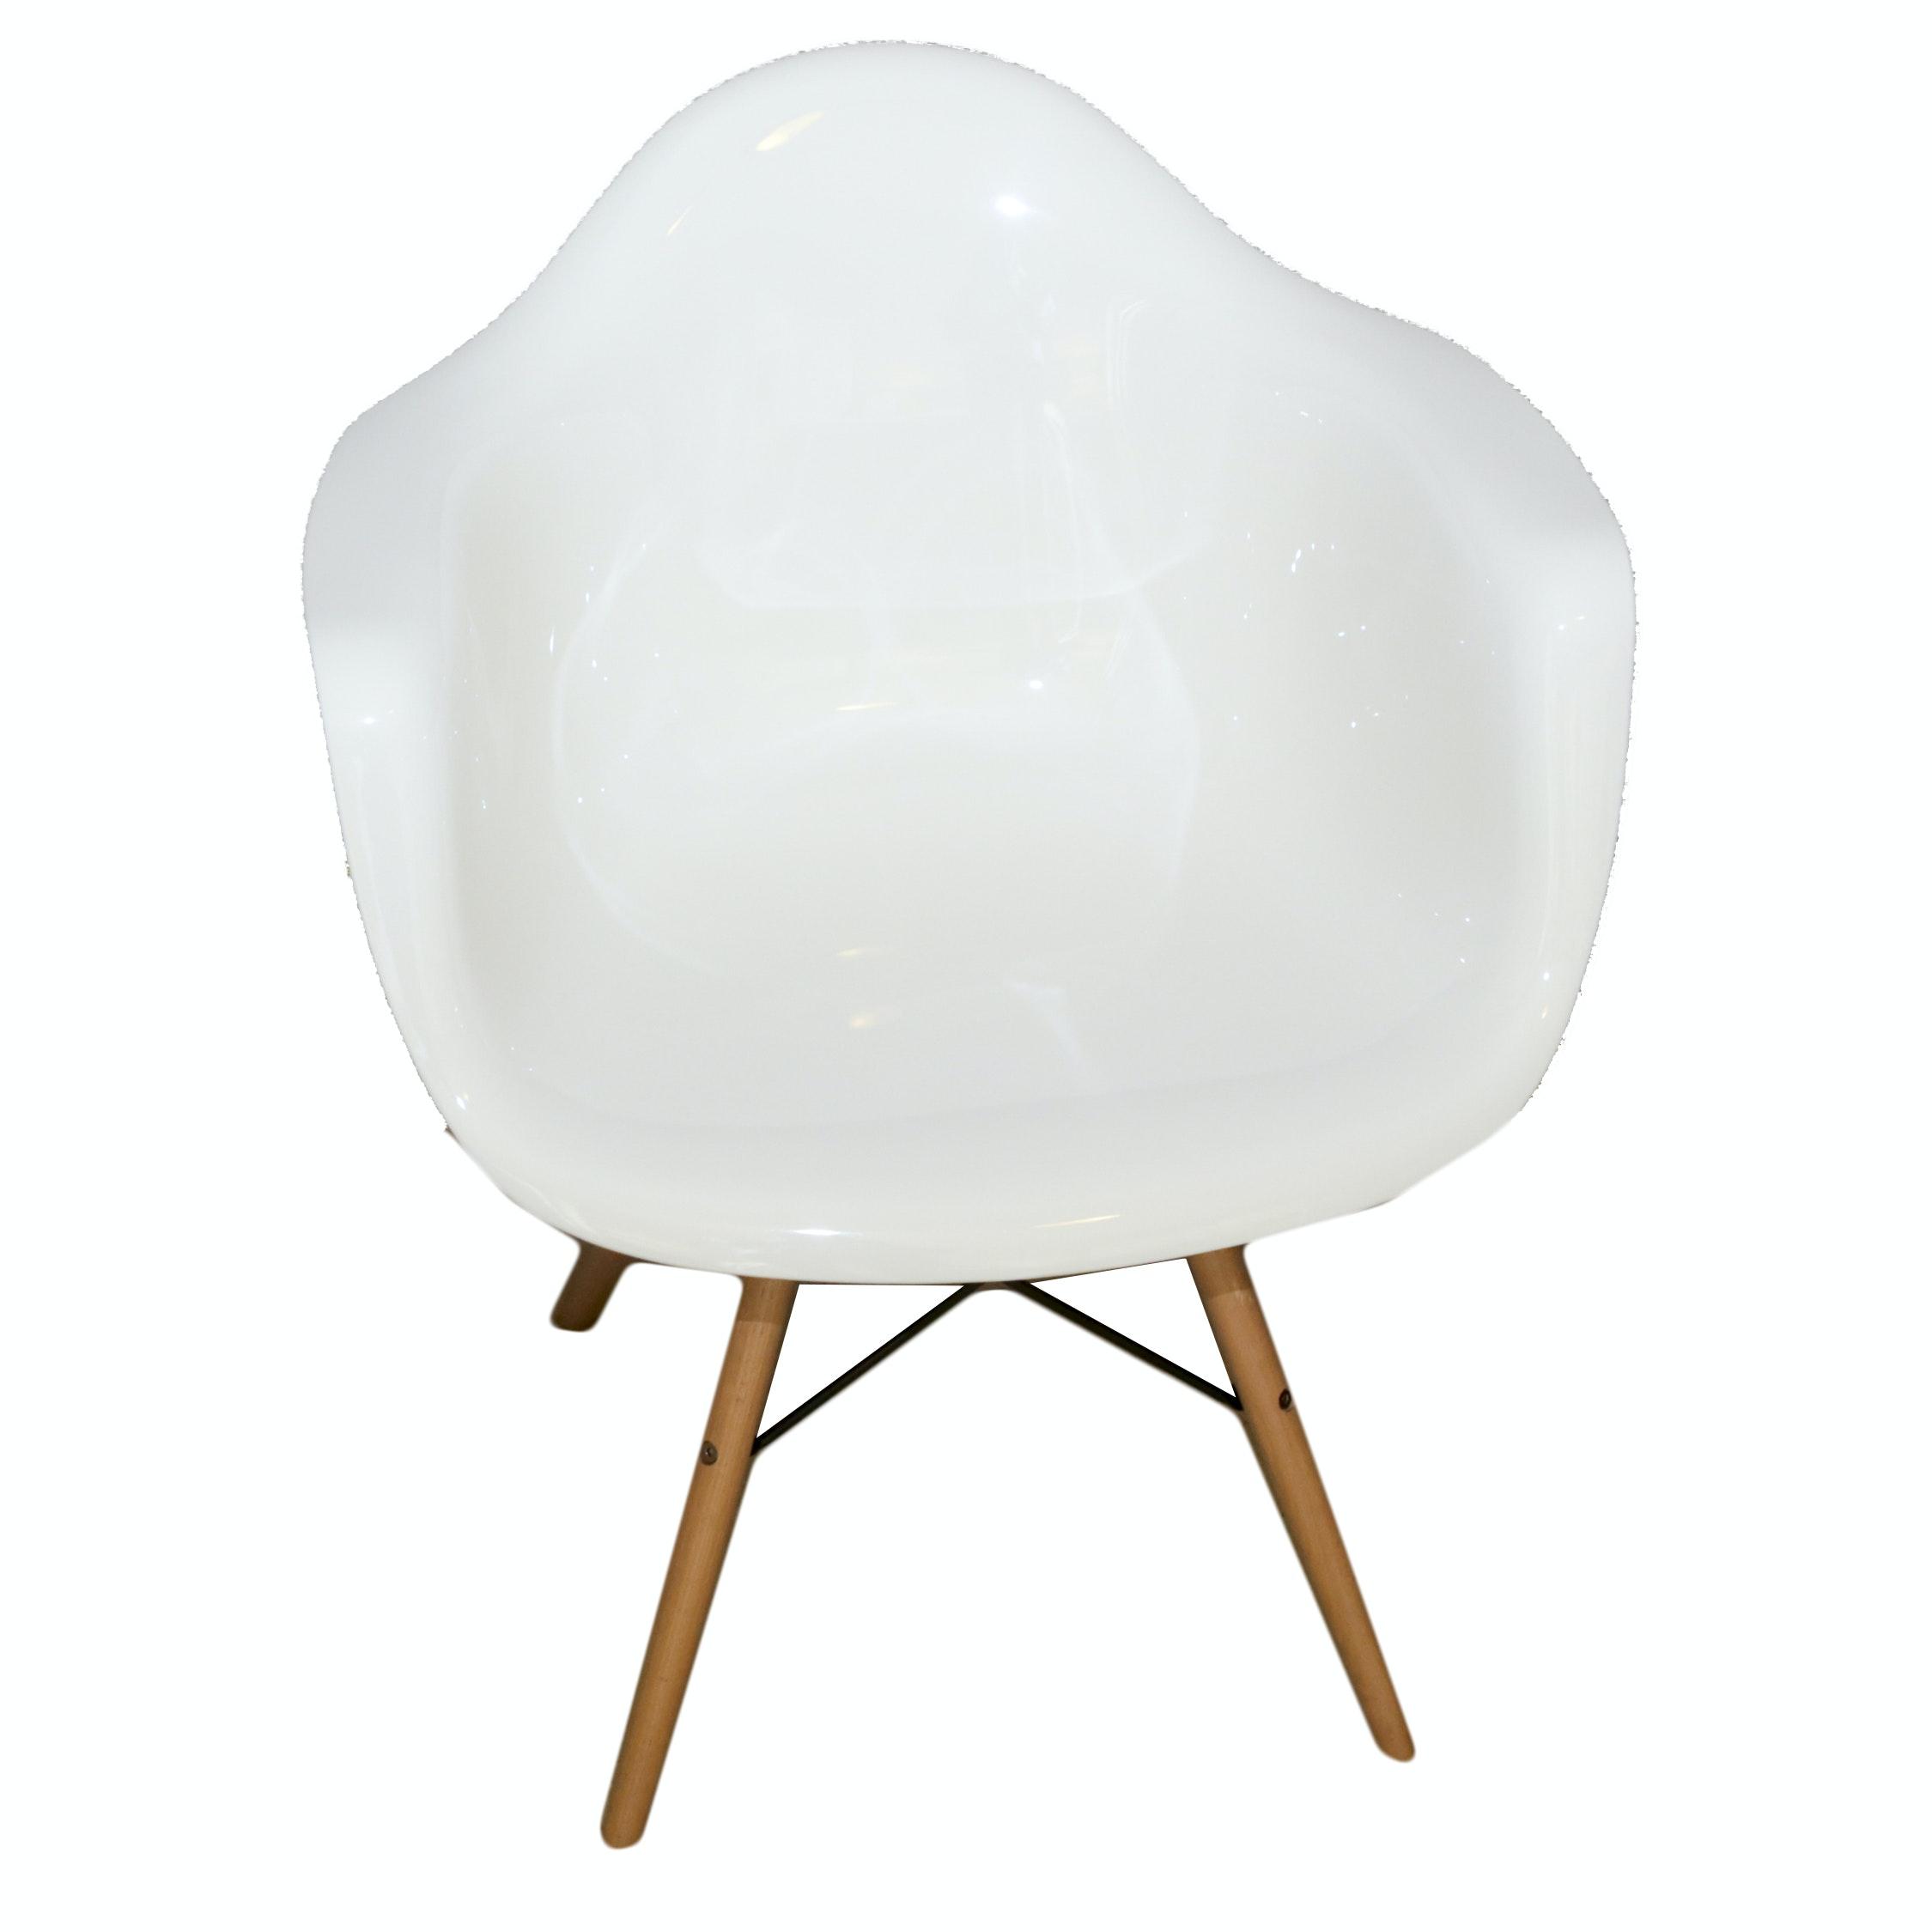 White Molded Plastic Armchair